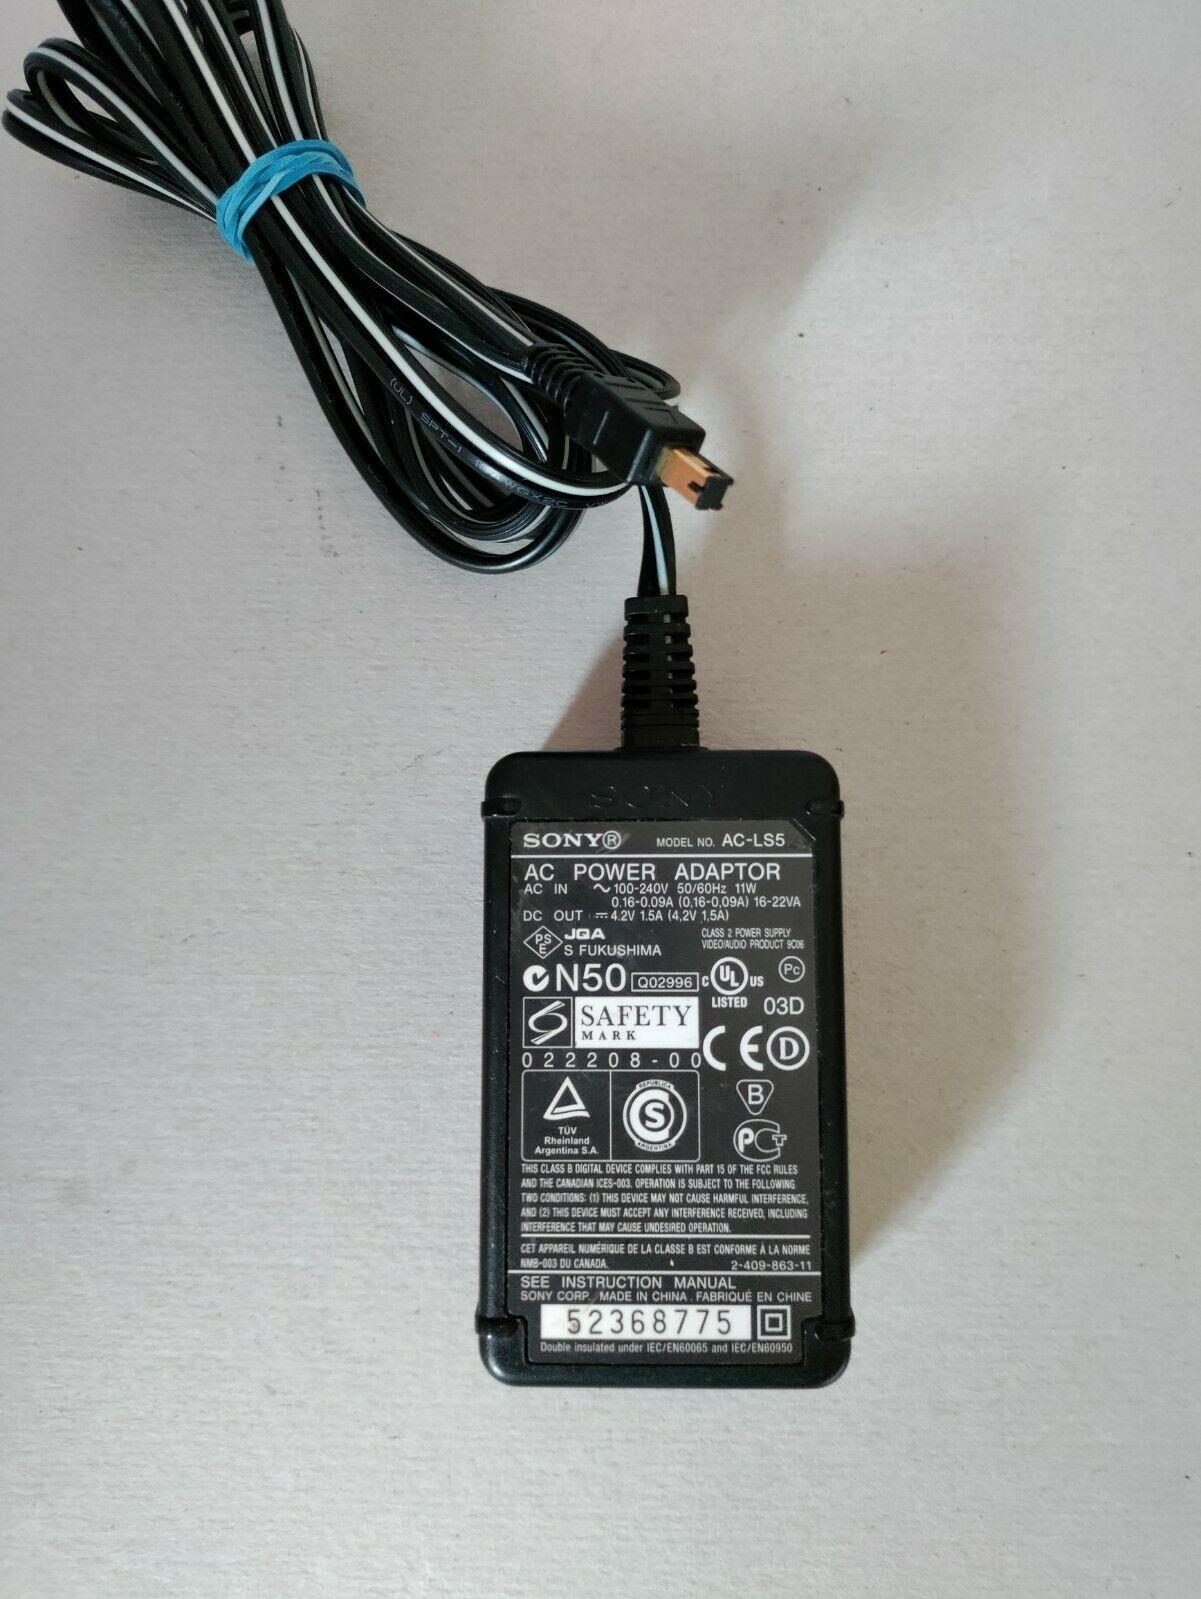 Sony AC-LS5 Power Adapter 4.2V 1.5A